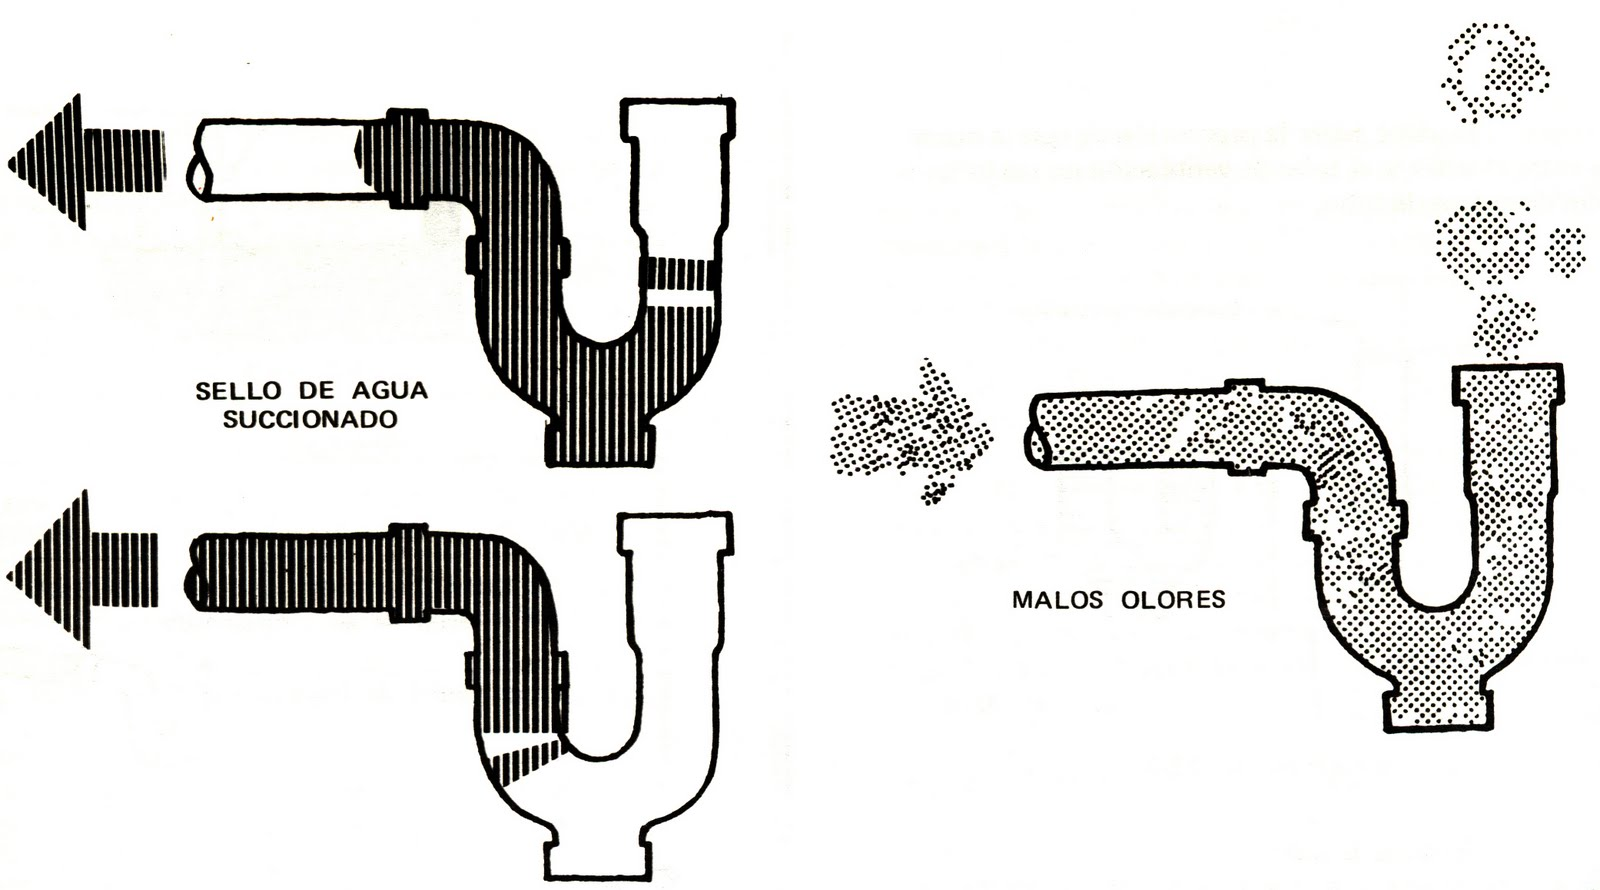 Taller de construcci n 1 arquis ucr sistema de for Construccion de piletas de agua